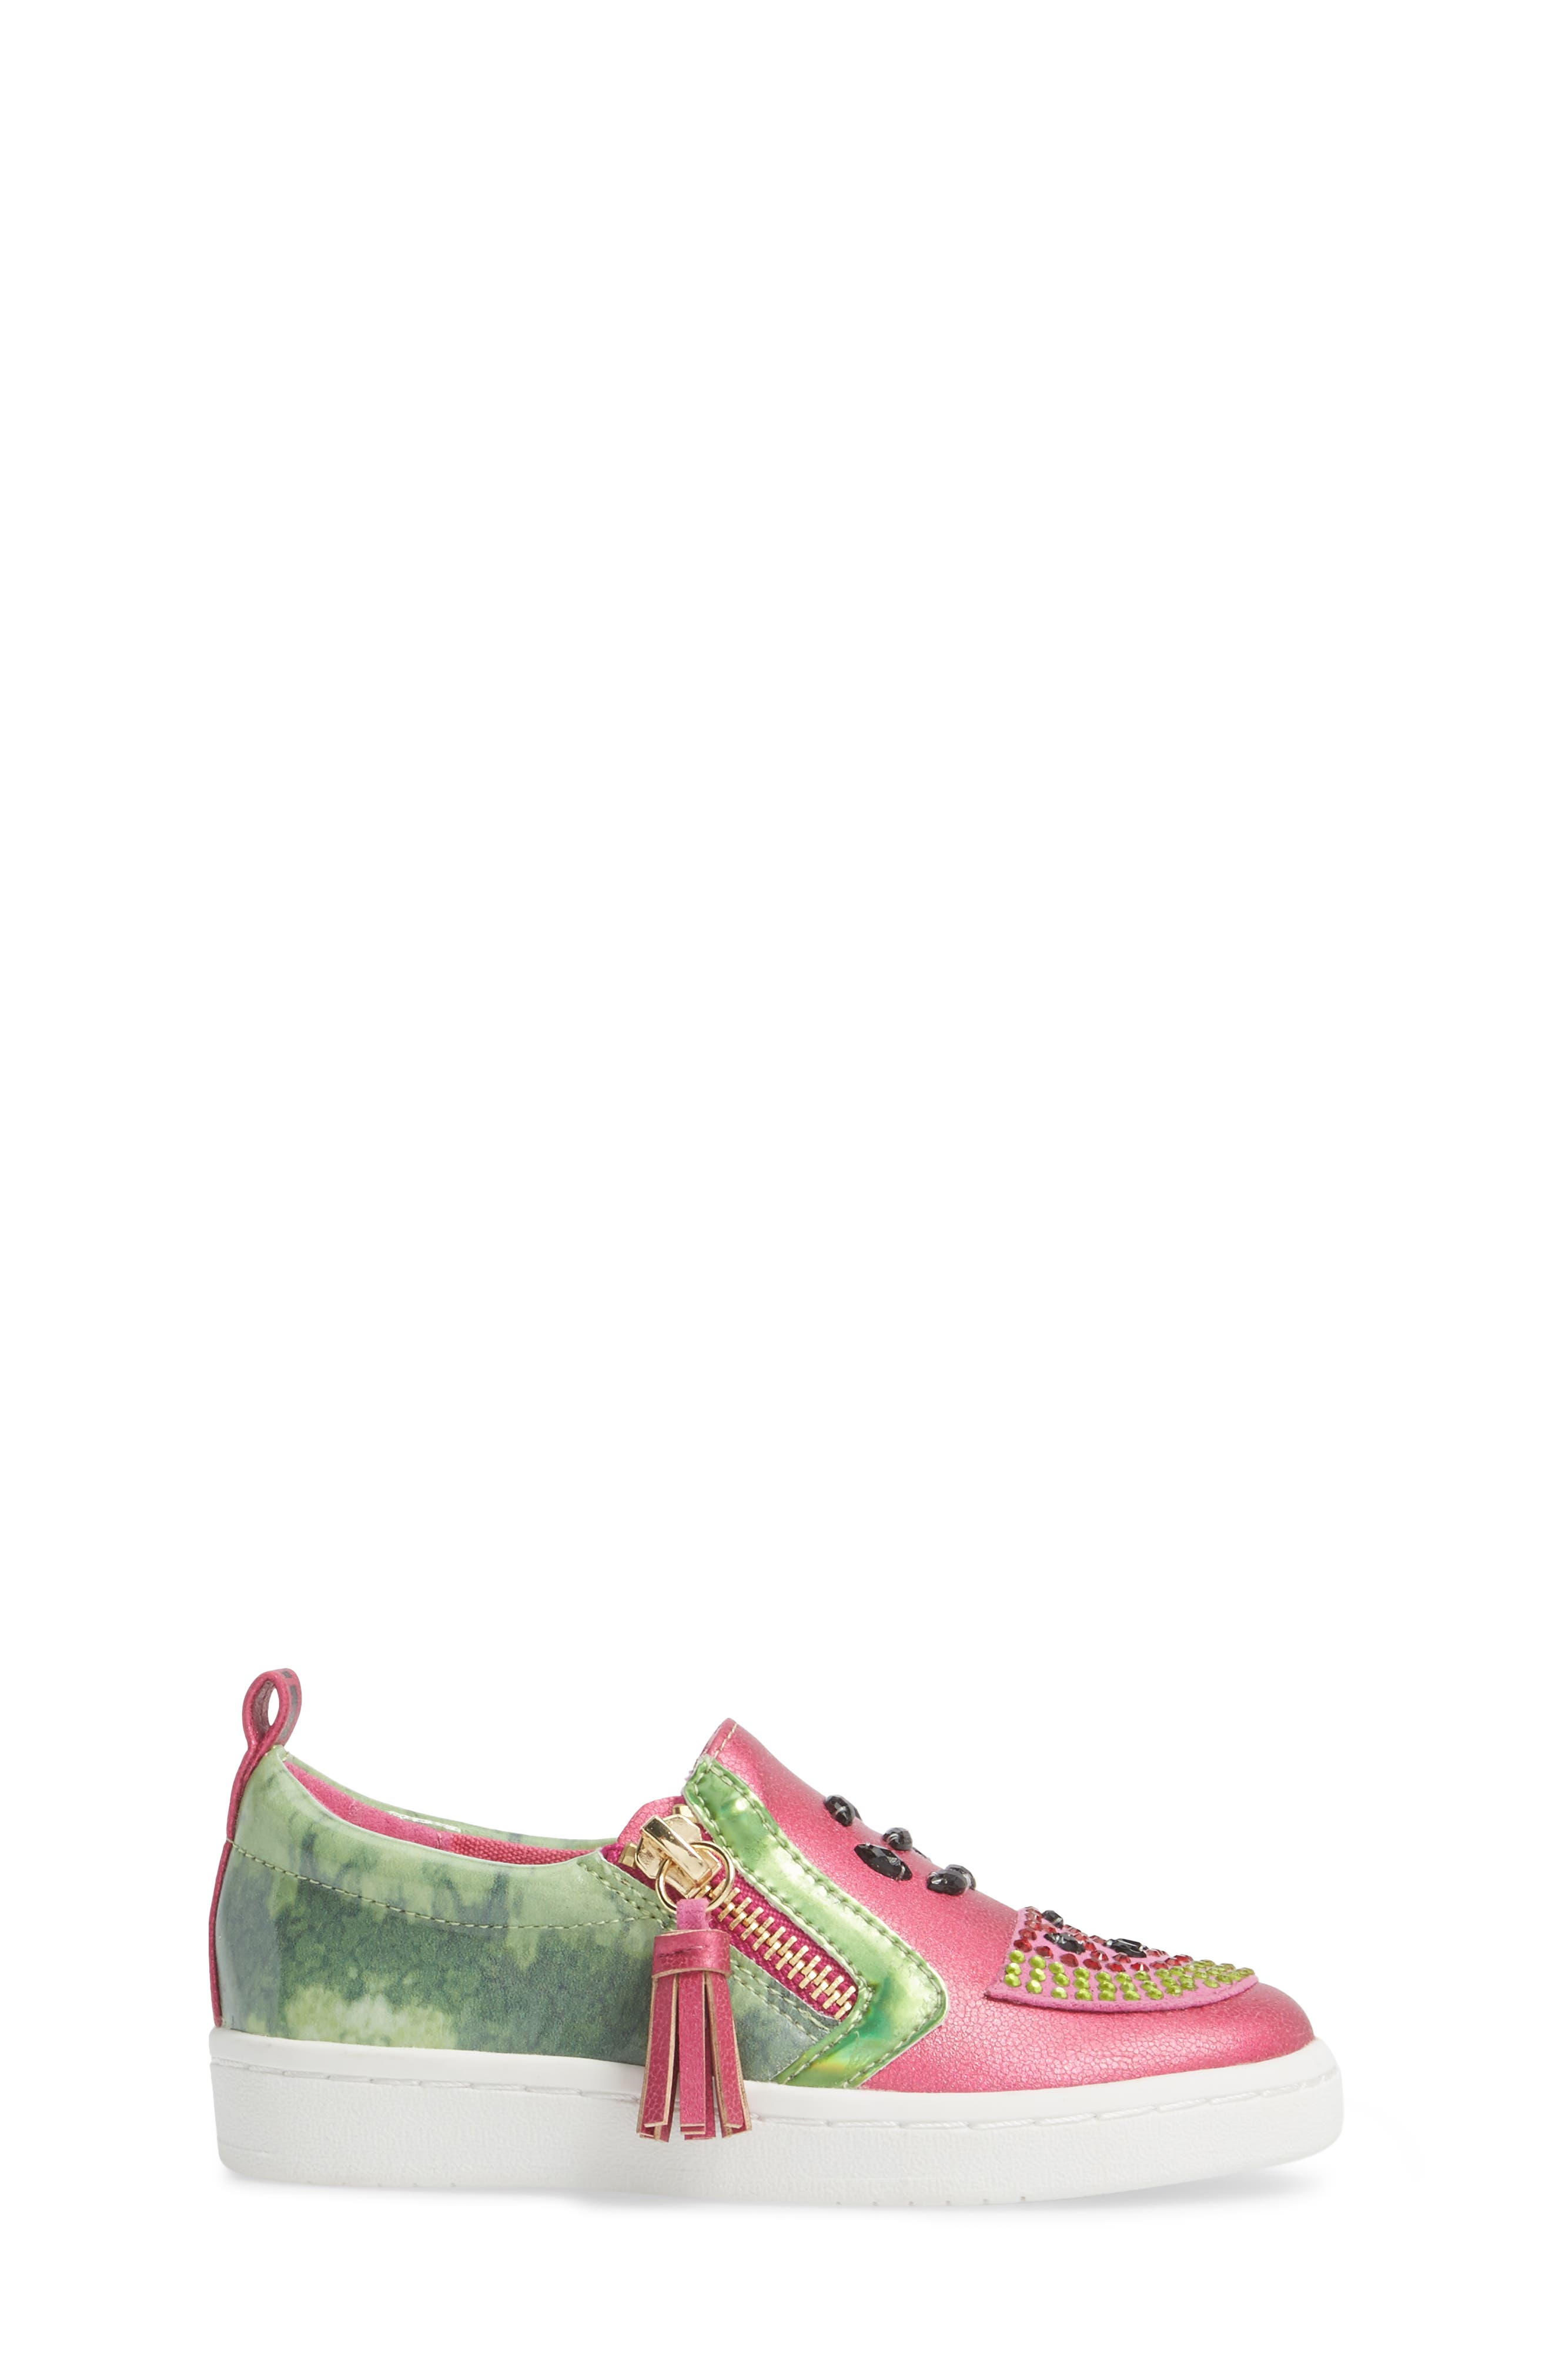 Blane Watermelon Sneaker,                             Alternate thumbnail 3, color,                             Fuchsia Patent Leather